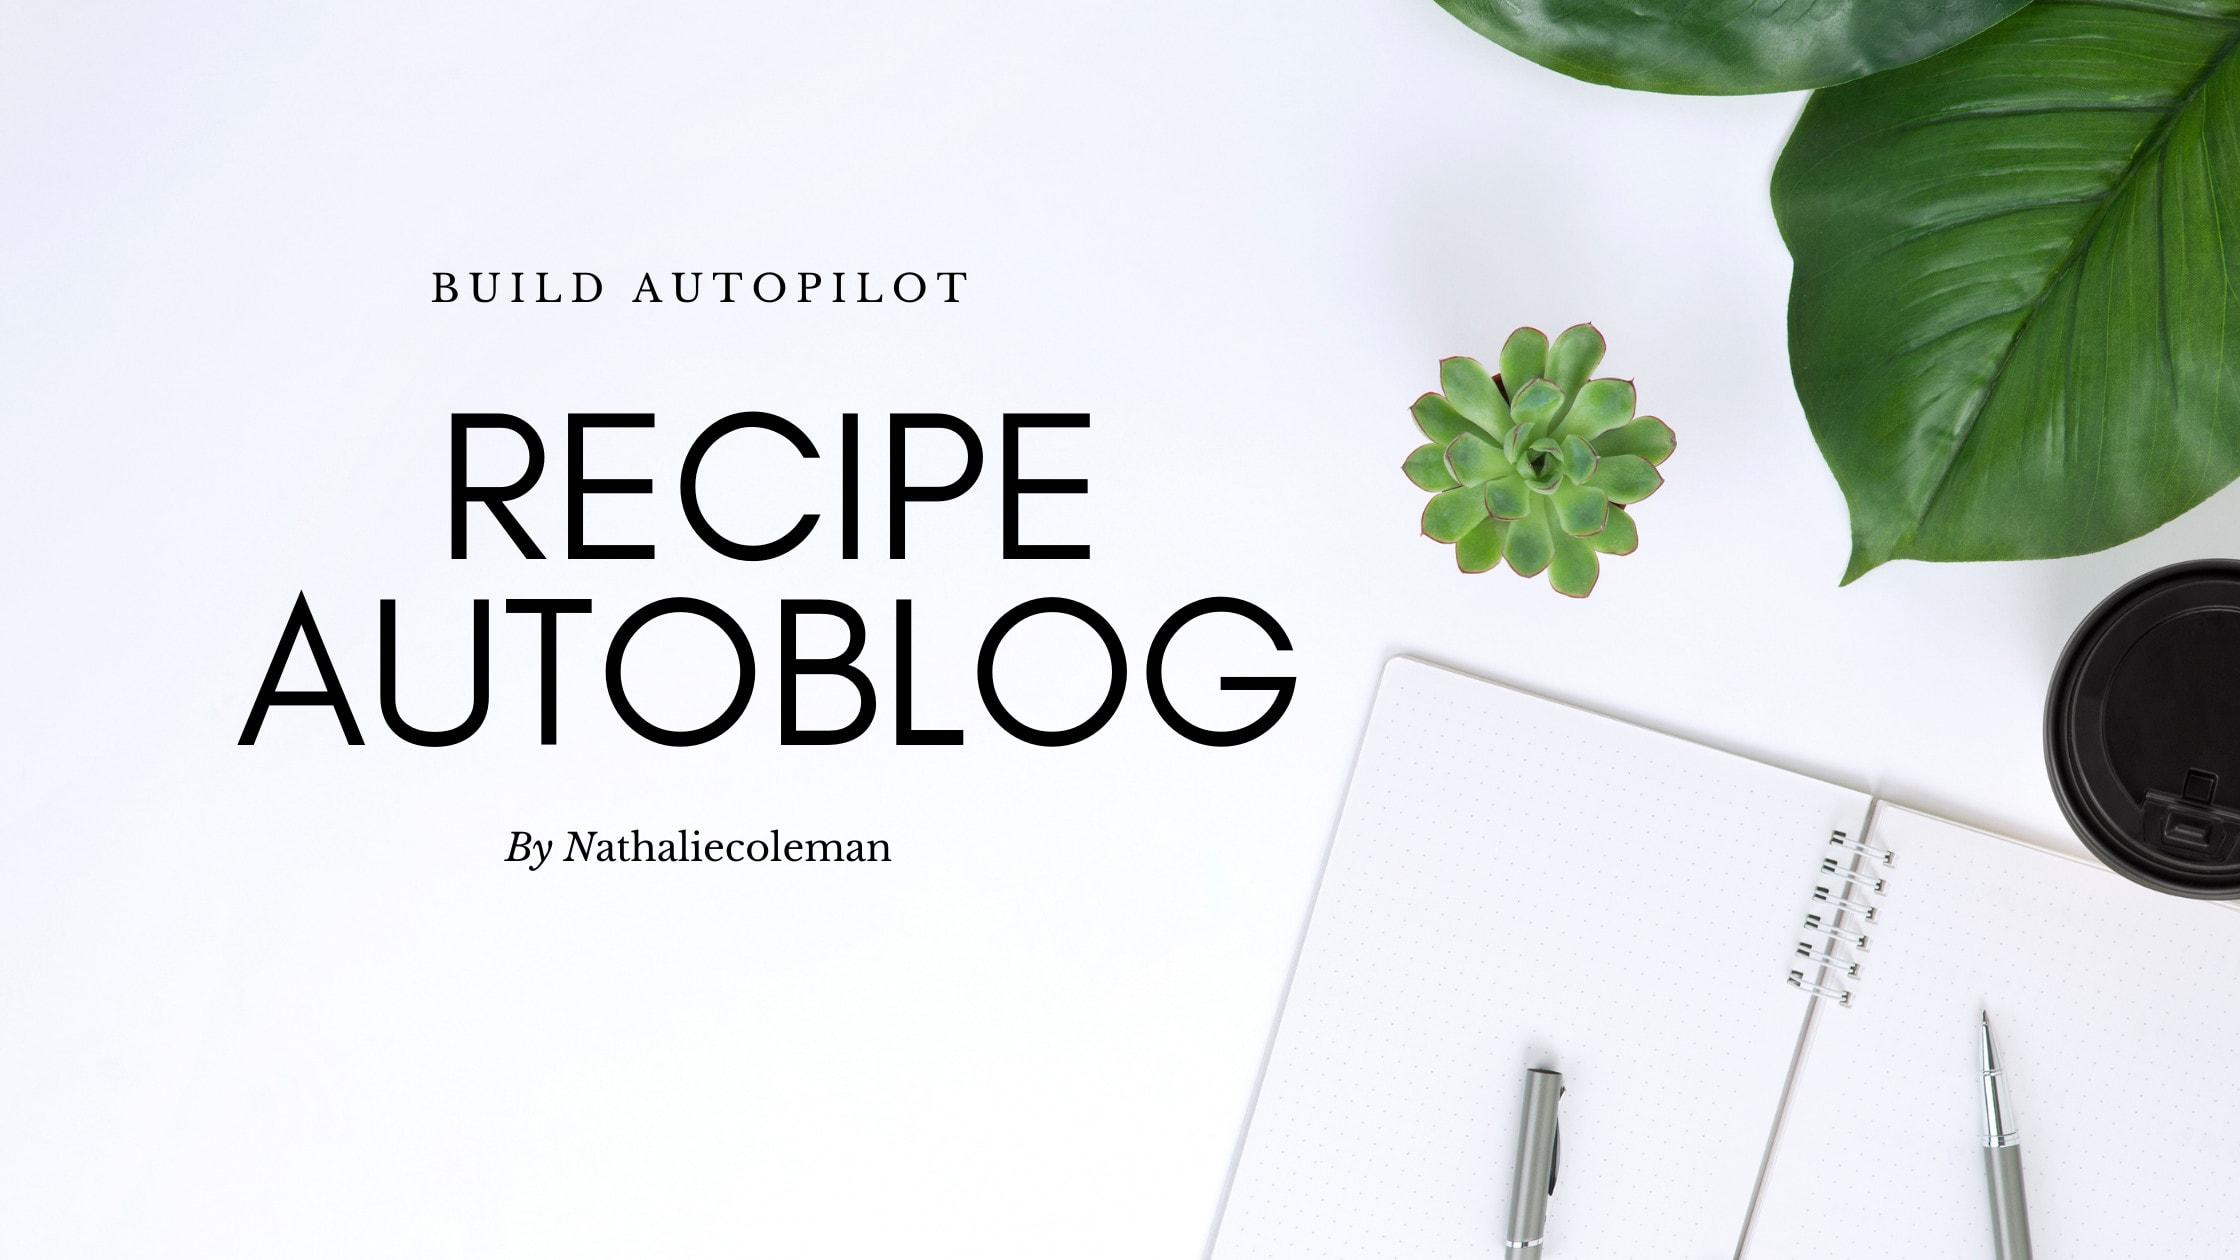 build autopilot food recipe autoblog for passive income